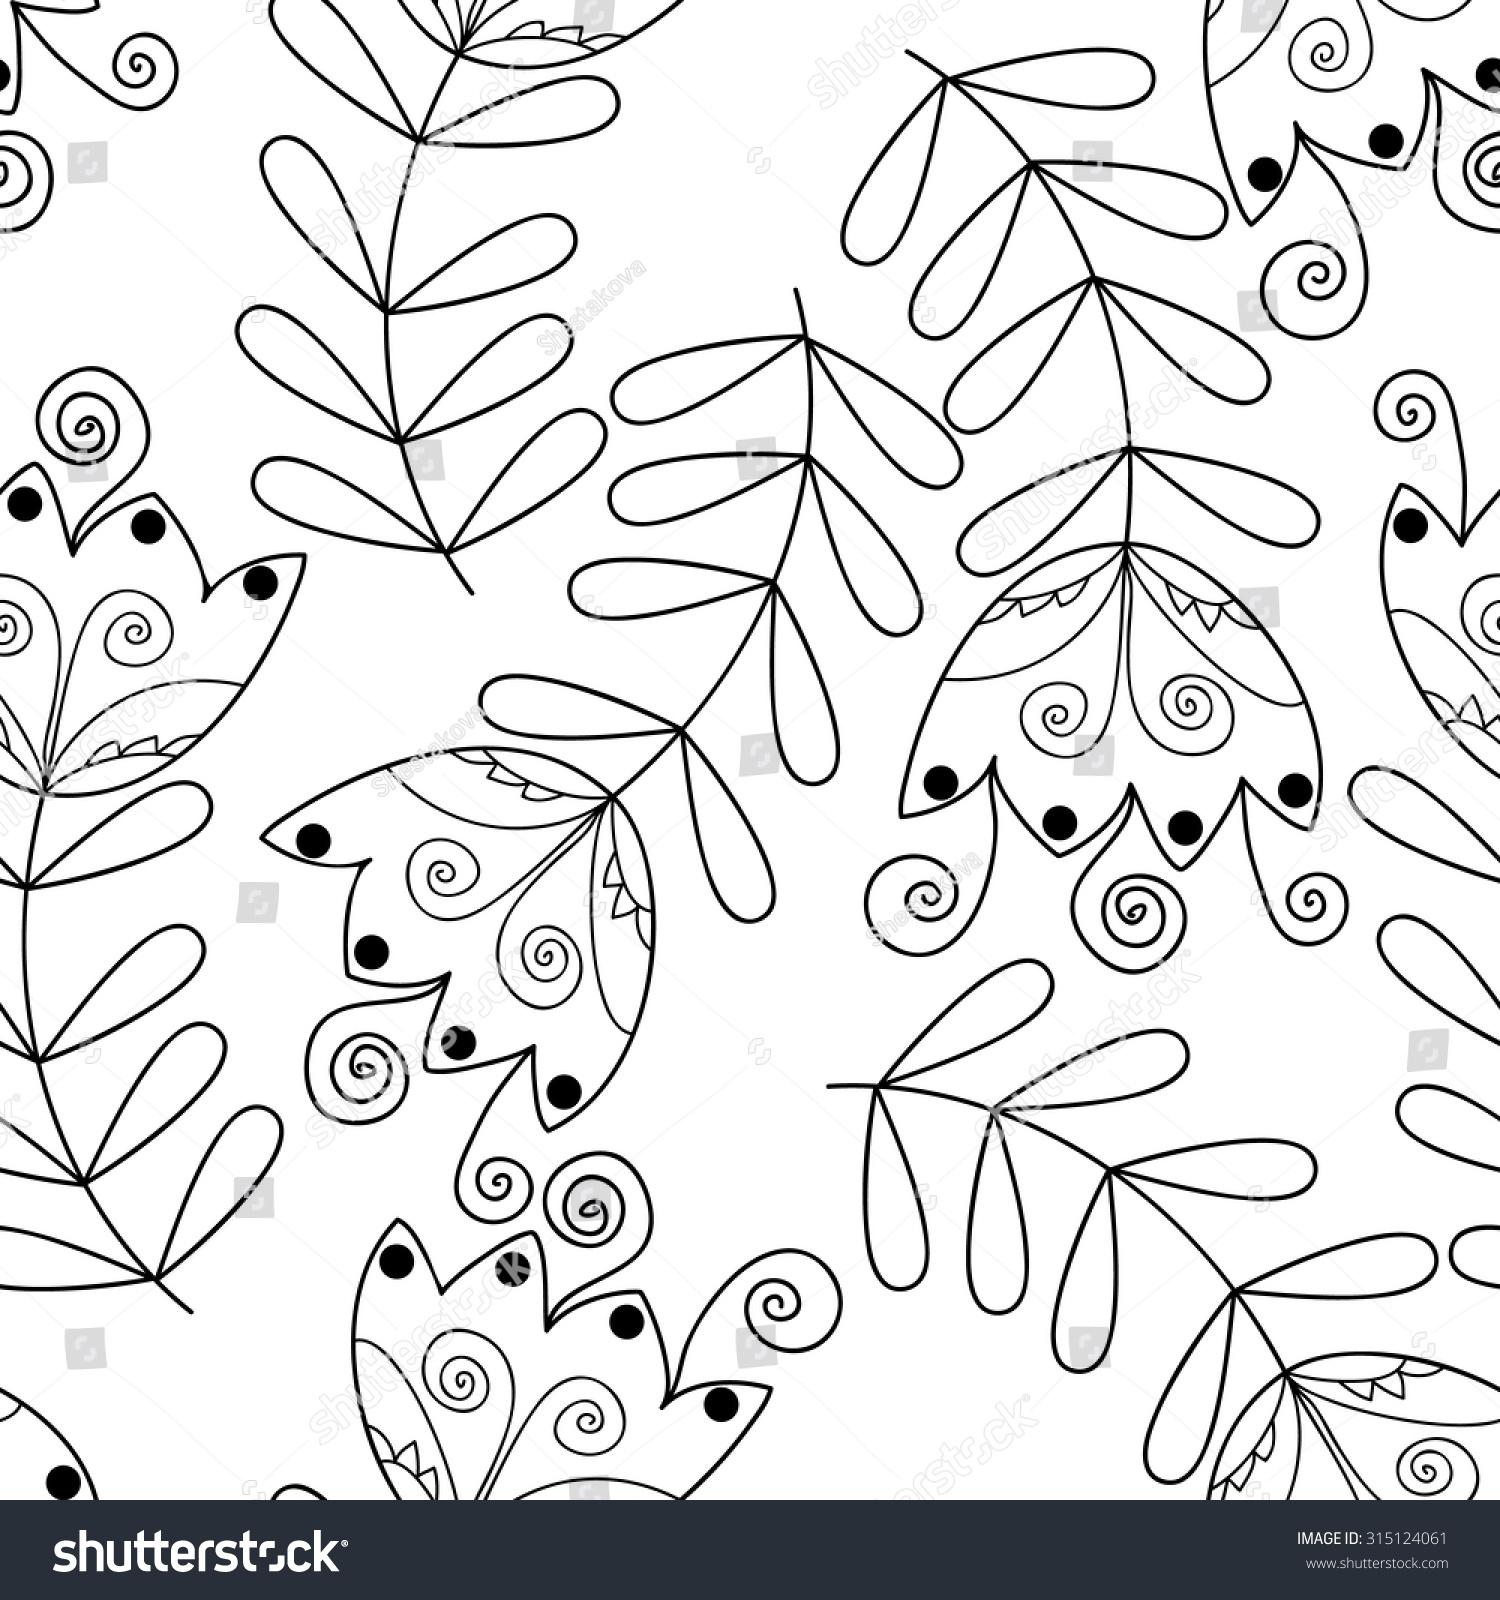 Vector Monochrome Flower Seamless Pattern Cute Stock Vector